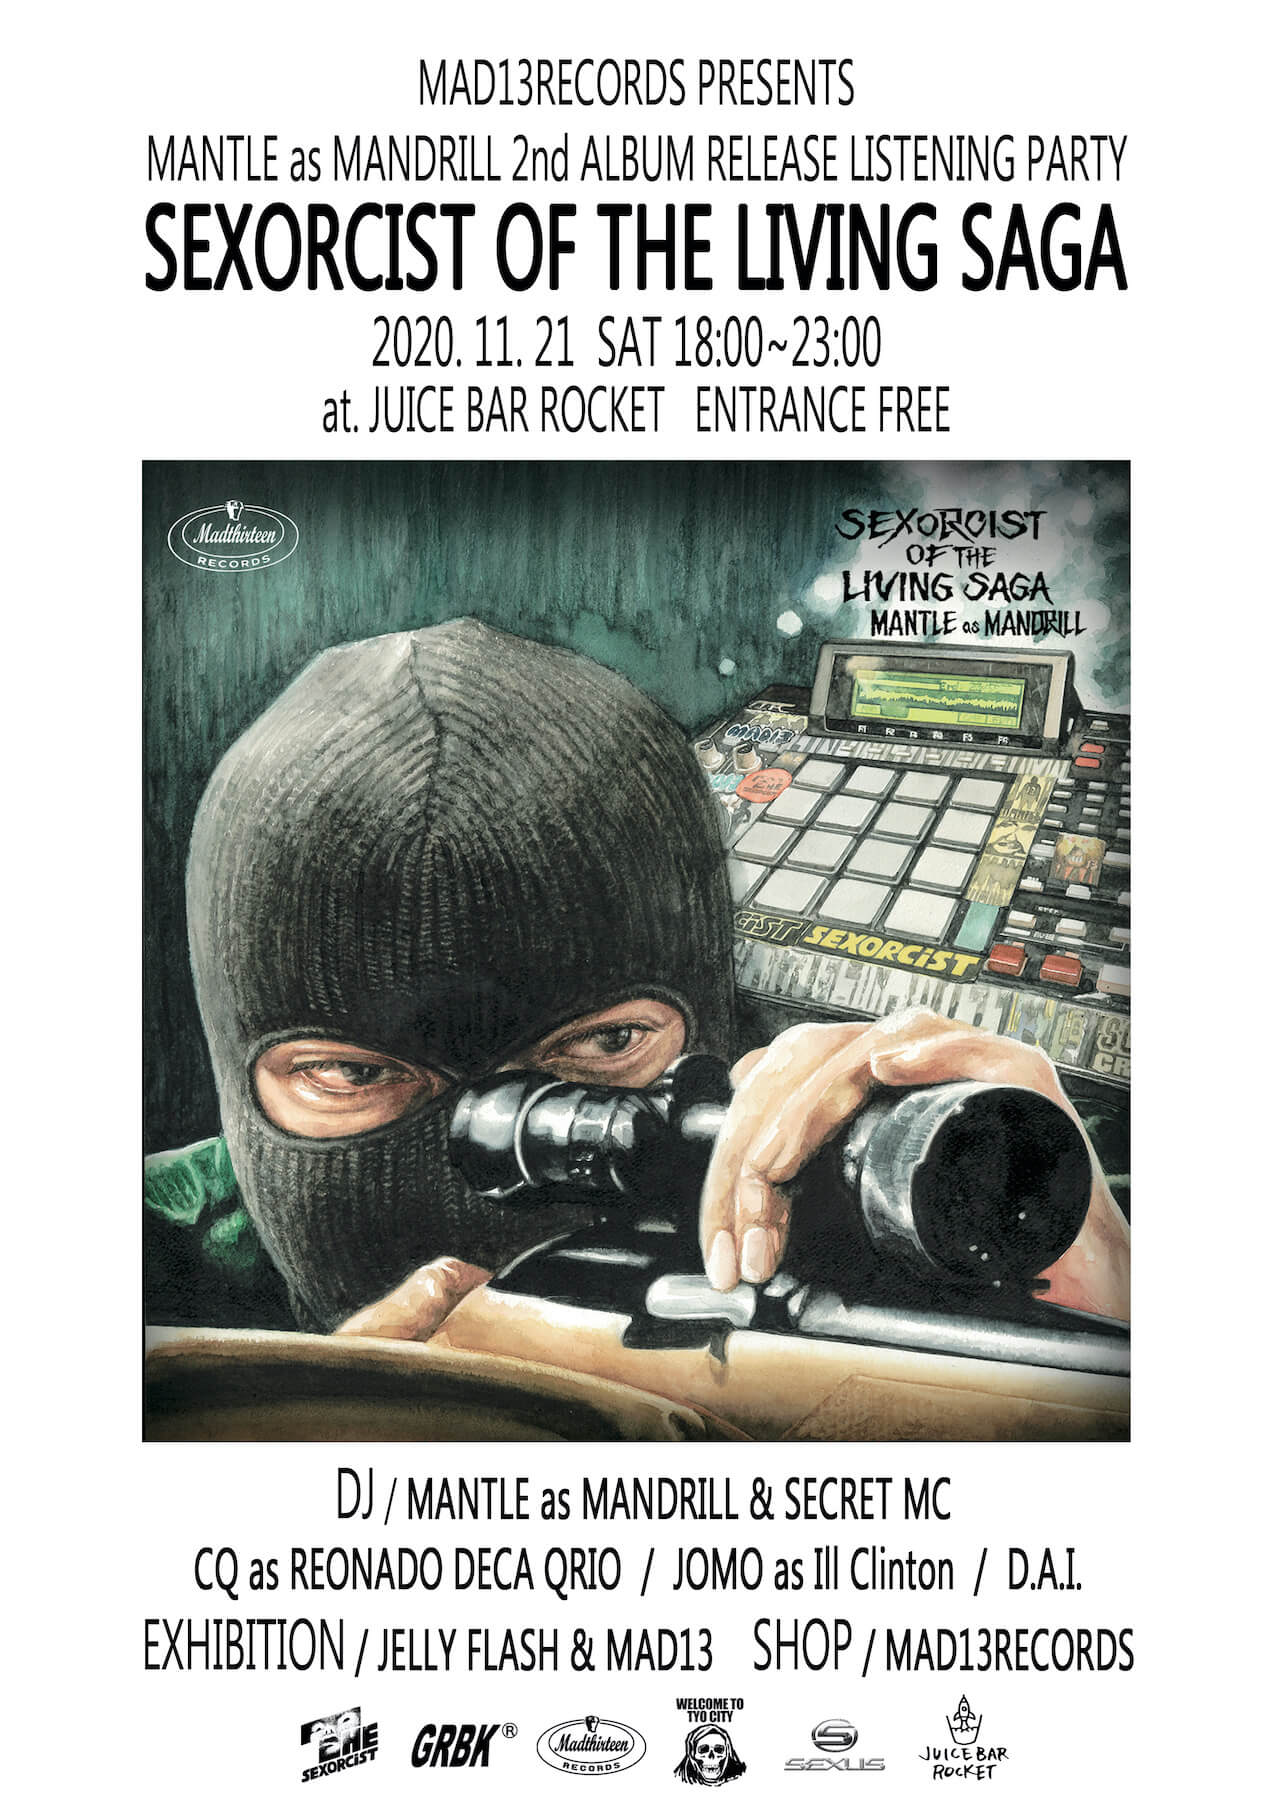 MANTLE as MANDRILLの最新作『SEXORCIST OF THE LIVING SAGA』から「KUROSAWA」のMVが公開 music201120-mantle-as-mandrill